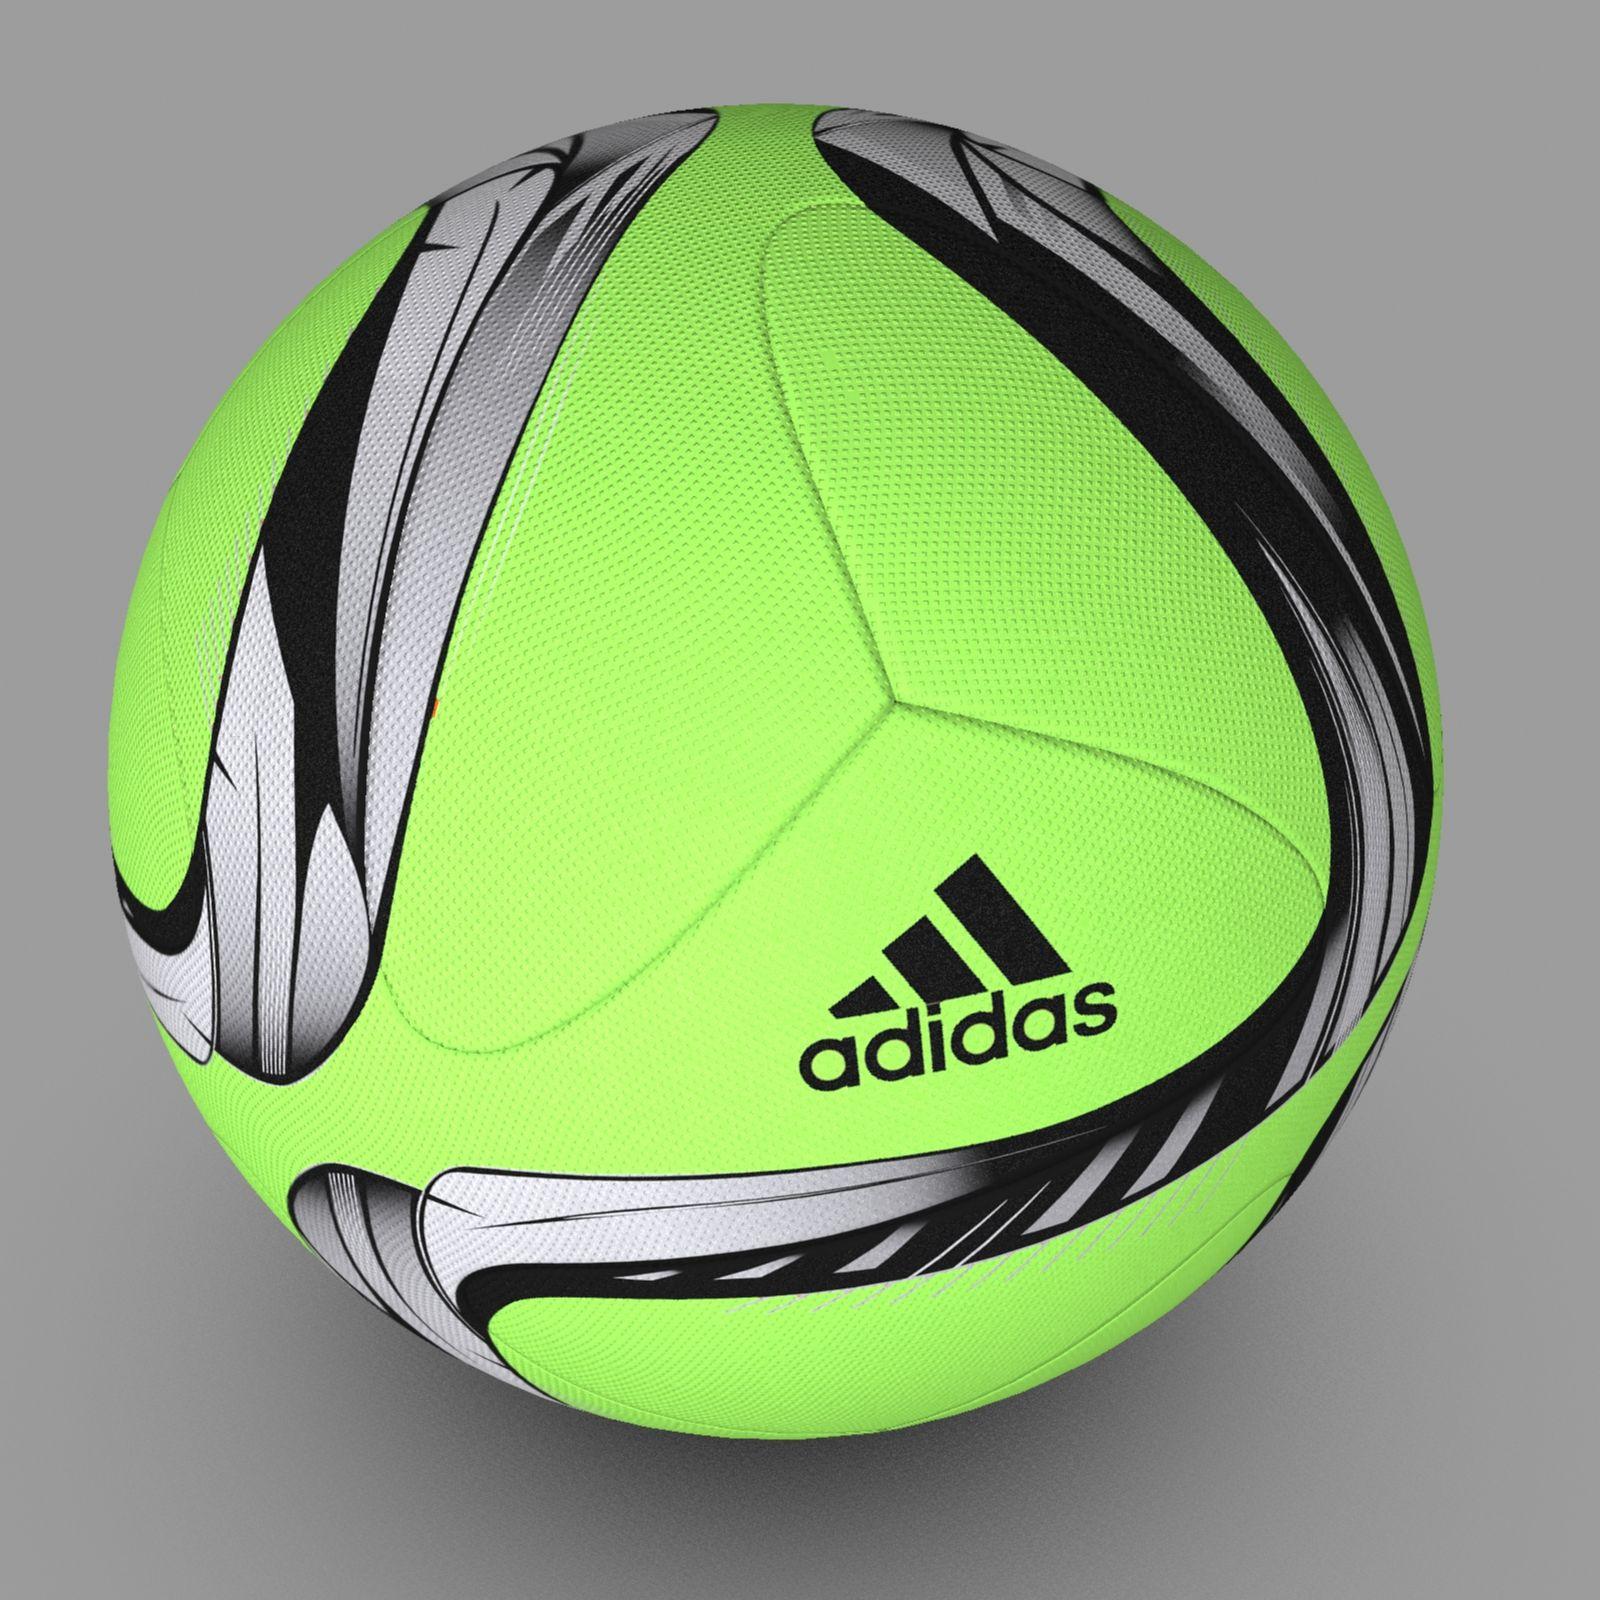 Adidas conext15 soccer ball green soccer ball soccer ball